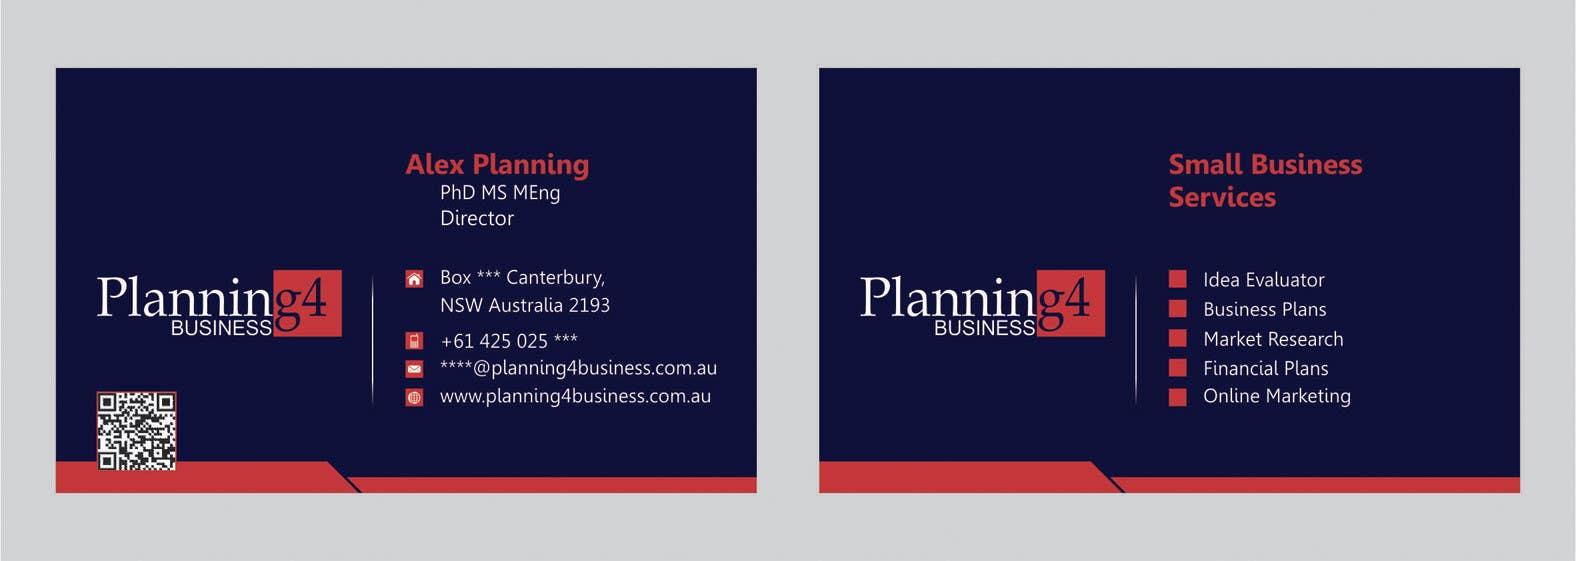 Penyertaan Peraduan #31 untuk Design some Business Cards for a business consultant